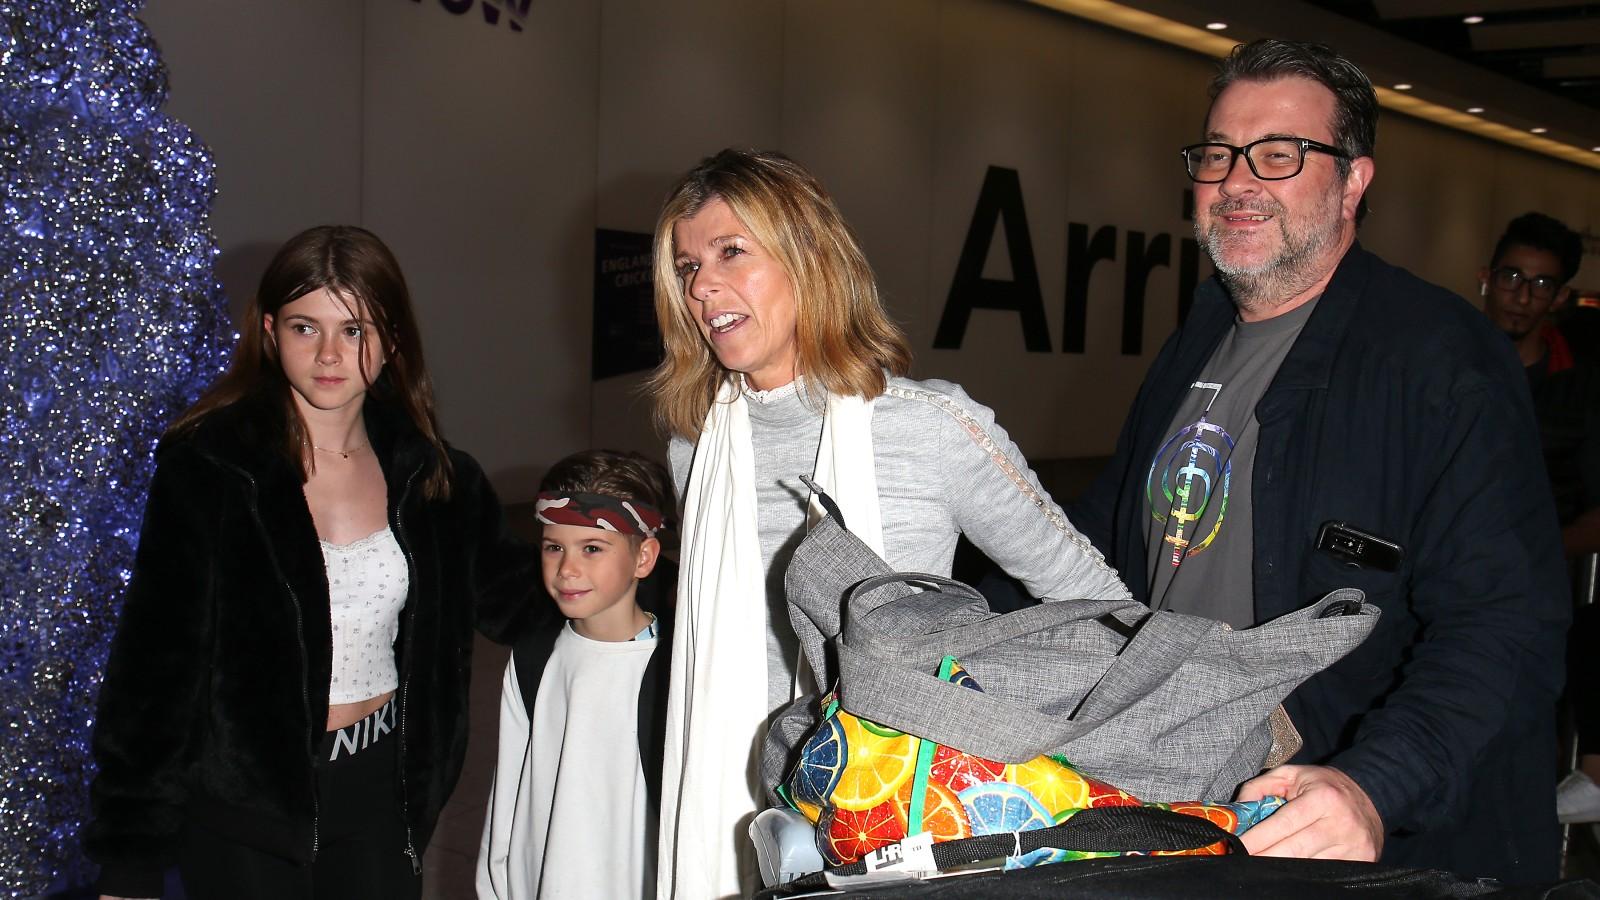 Kate Garraway, Derek Draper, et leurs enfants Darcey et Billy.